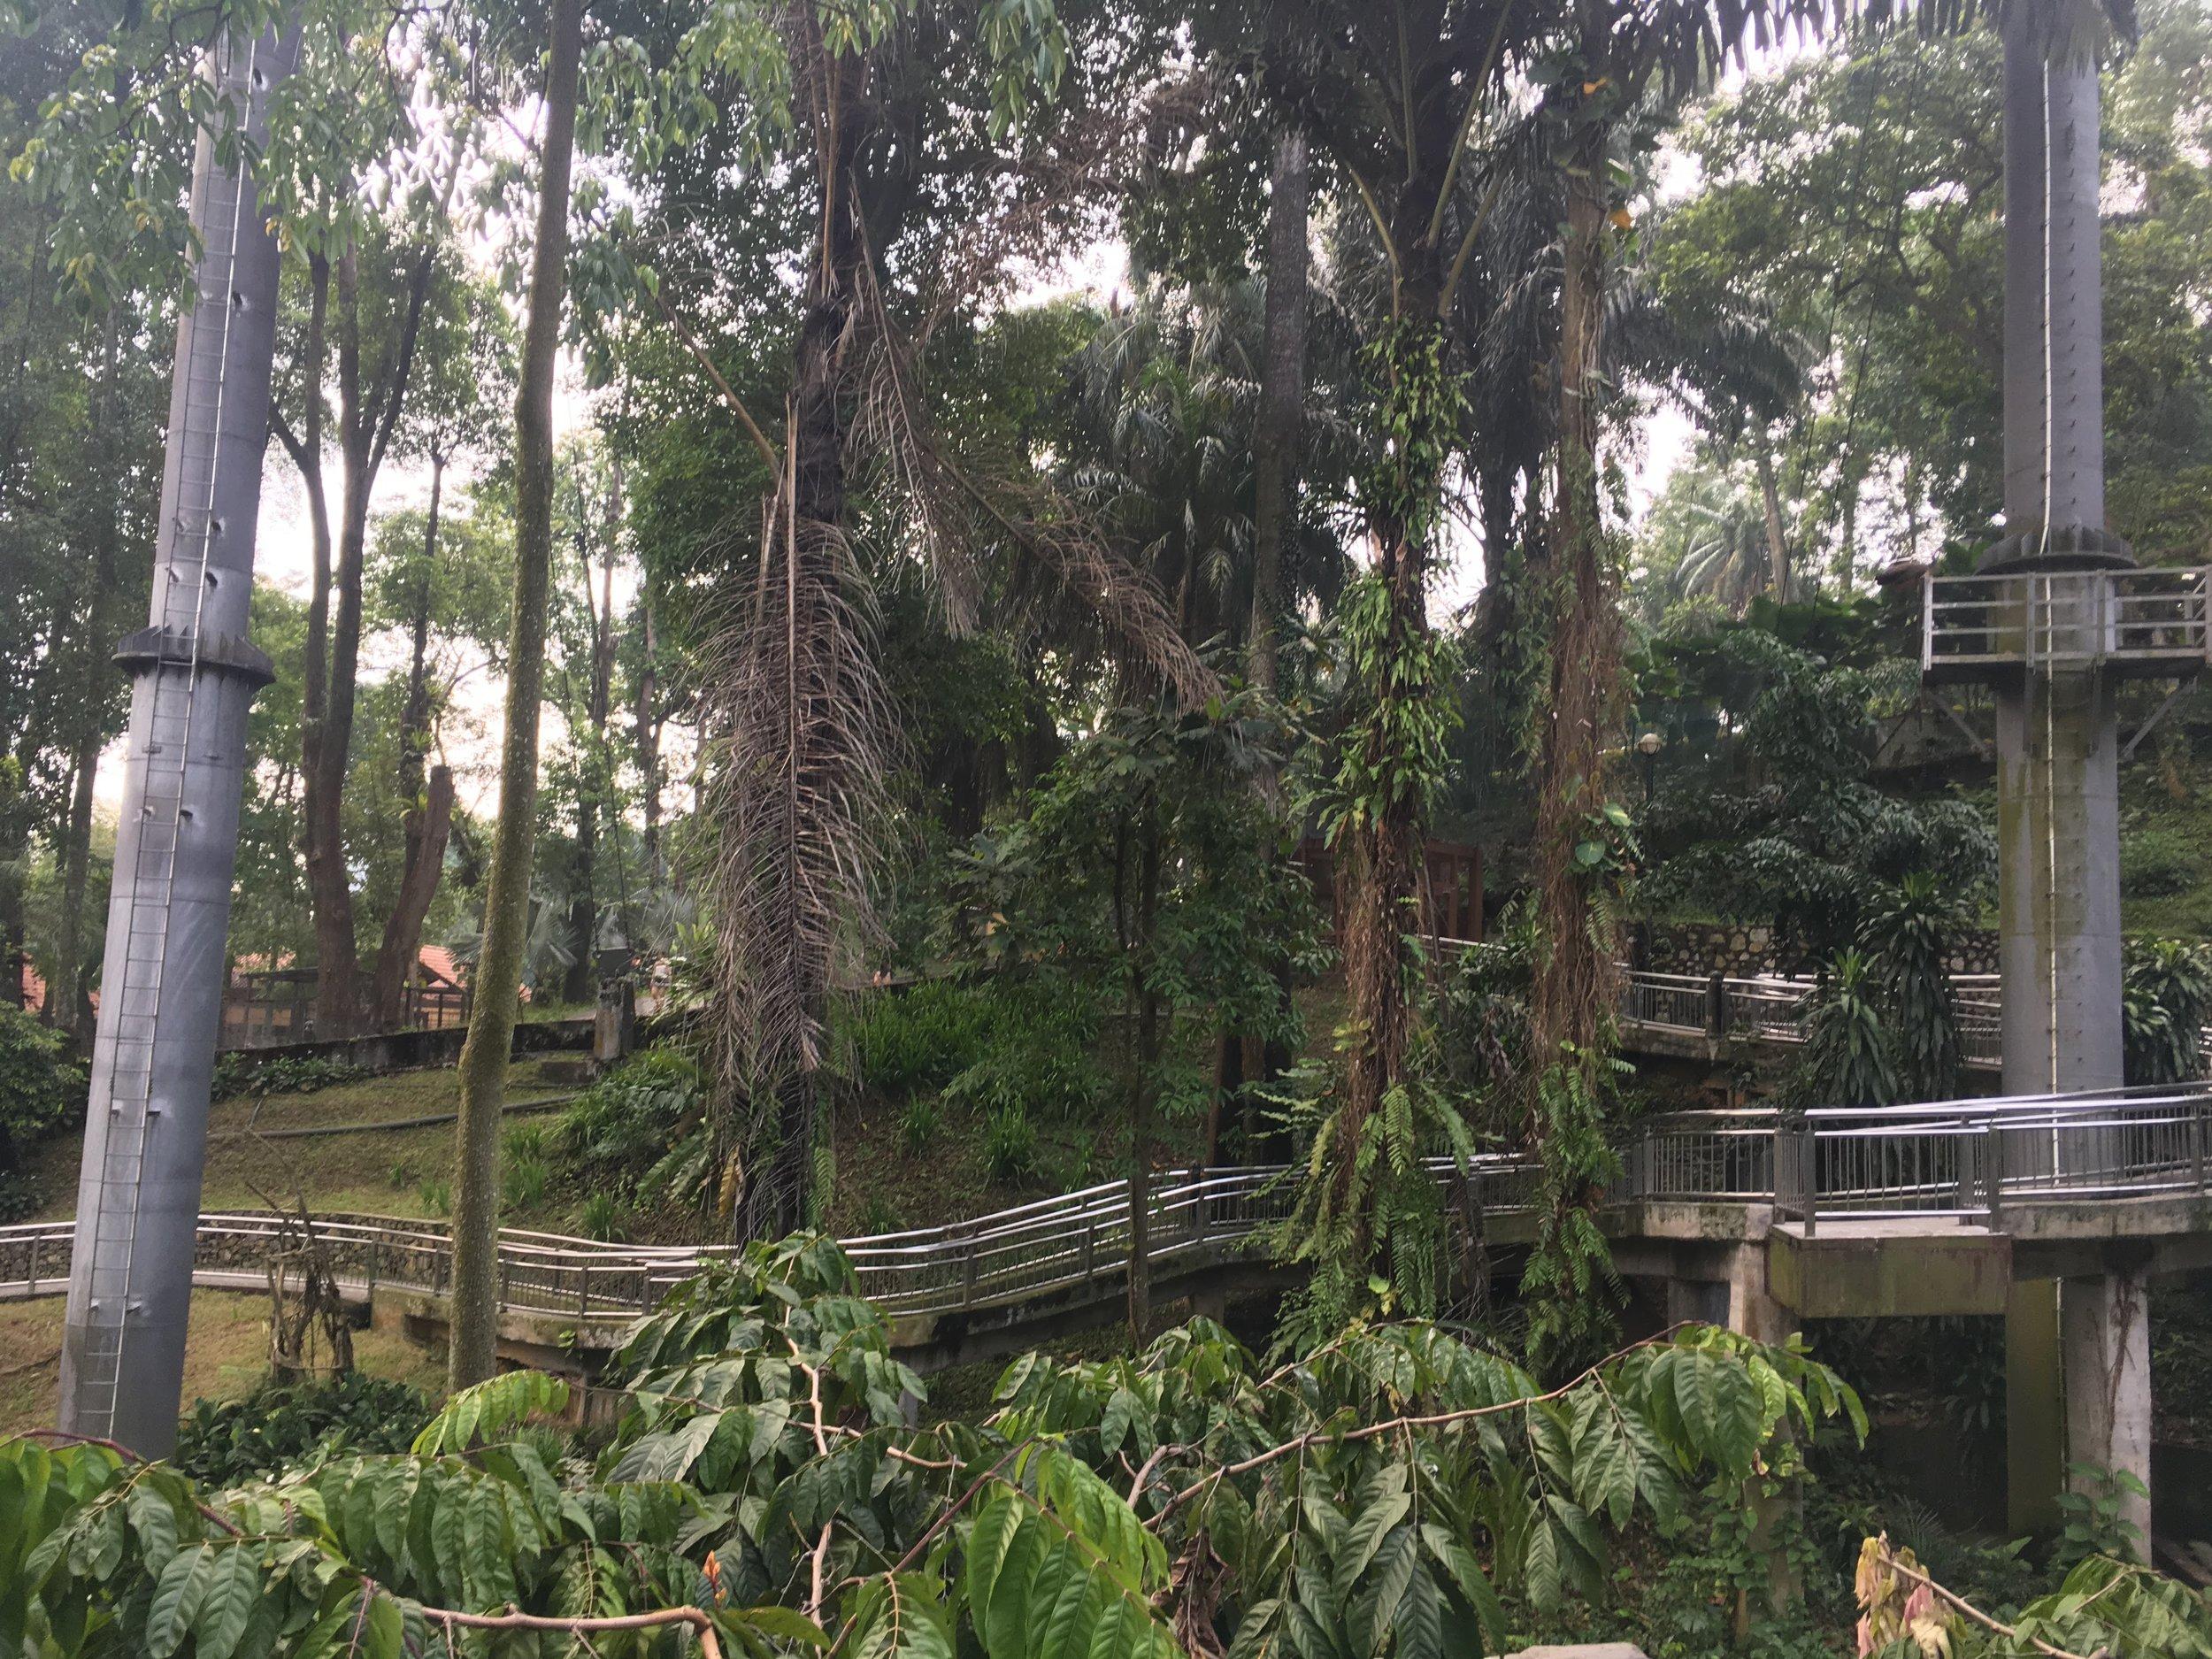 jungle path at KL Bird Park, Kuala Lumpur, Malaysia